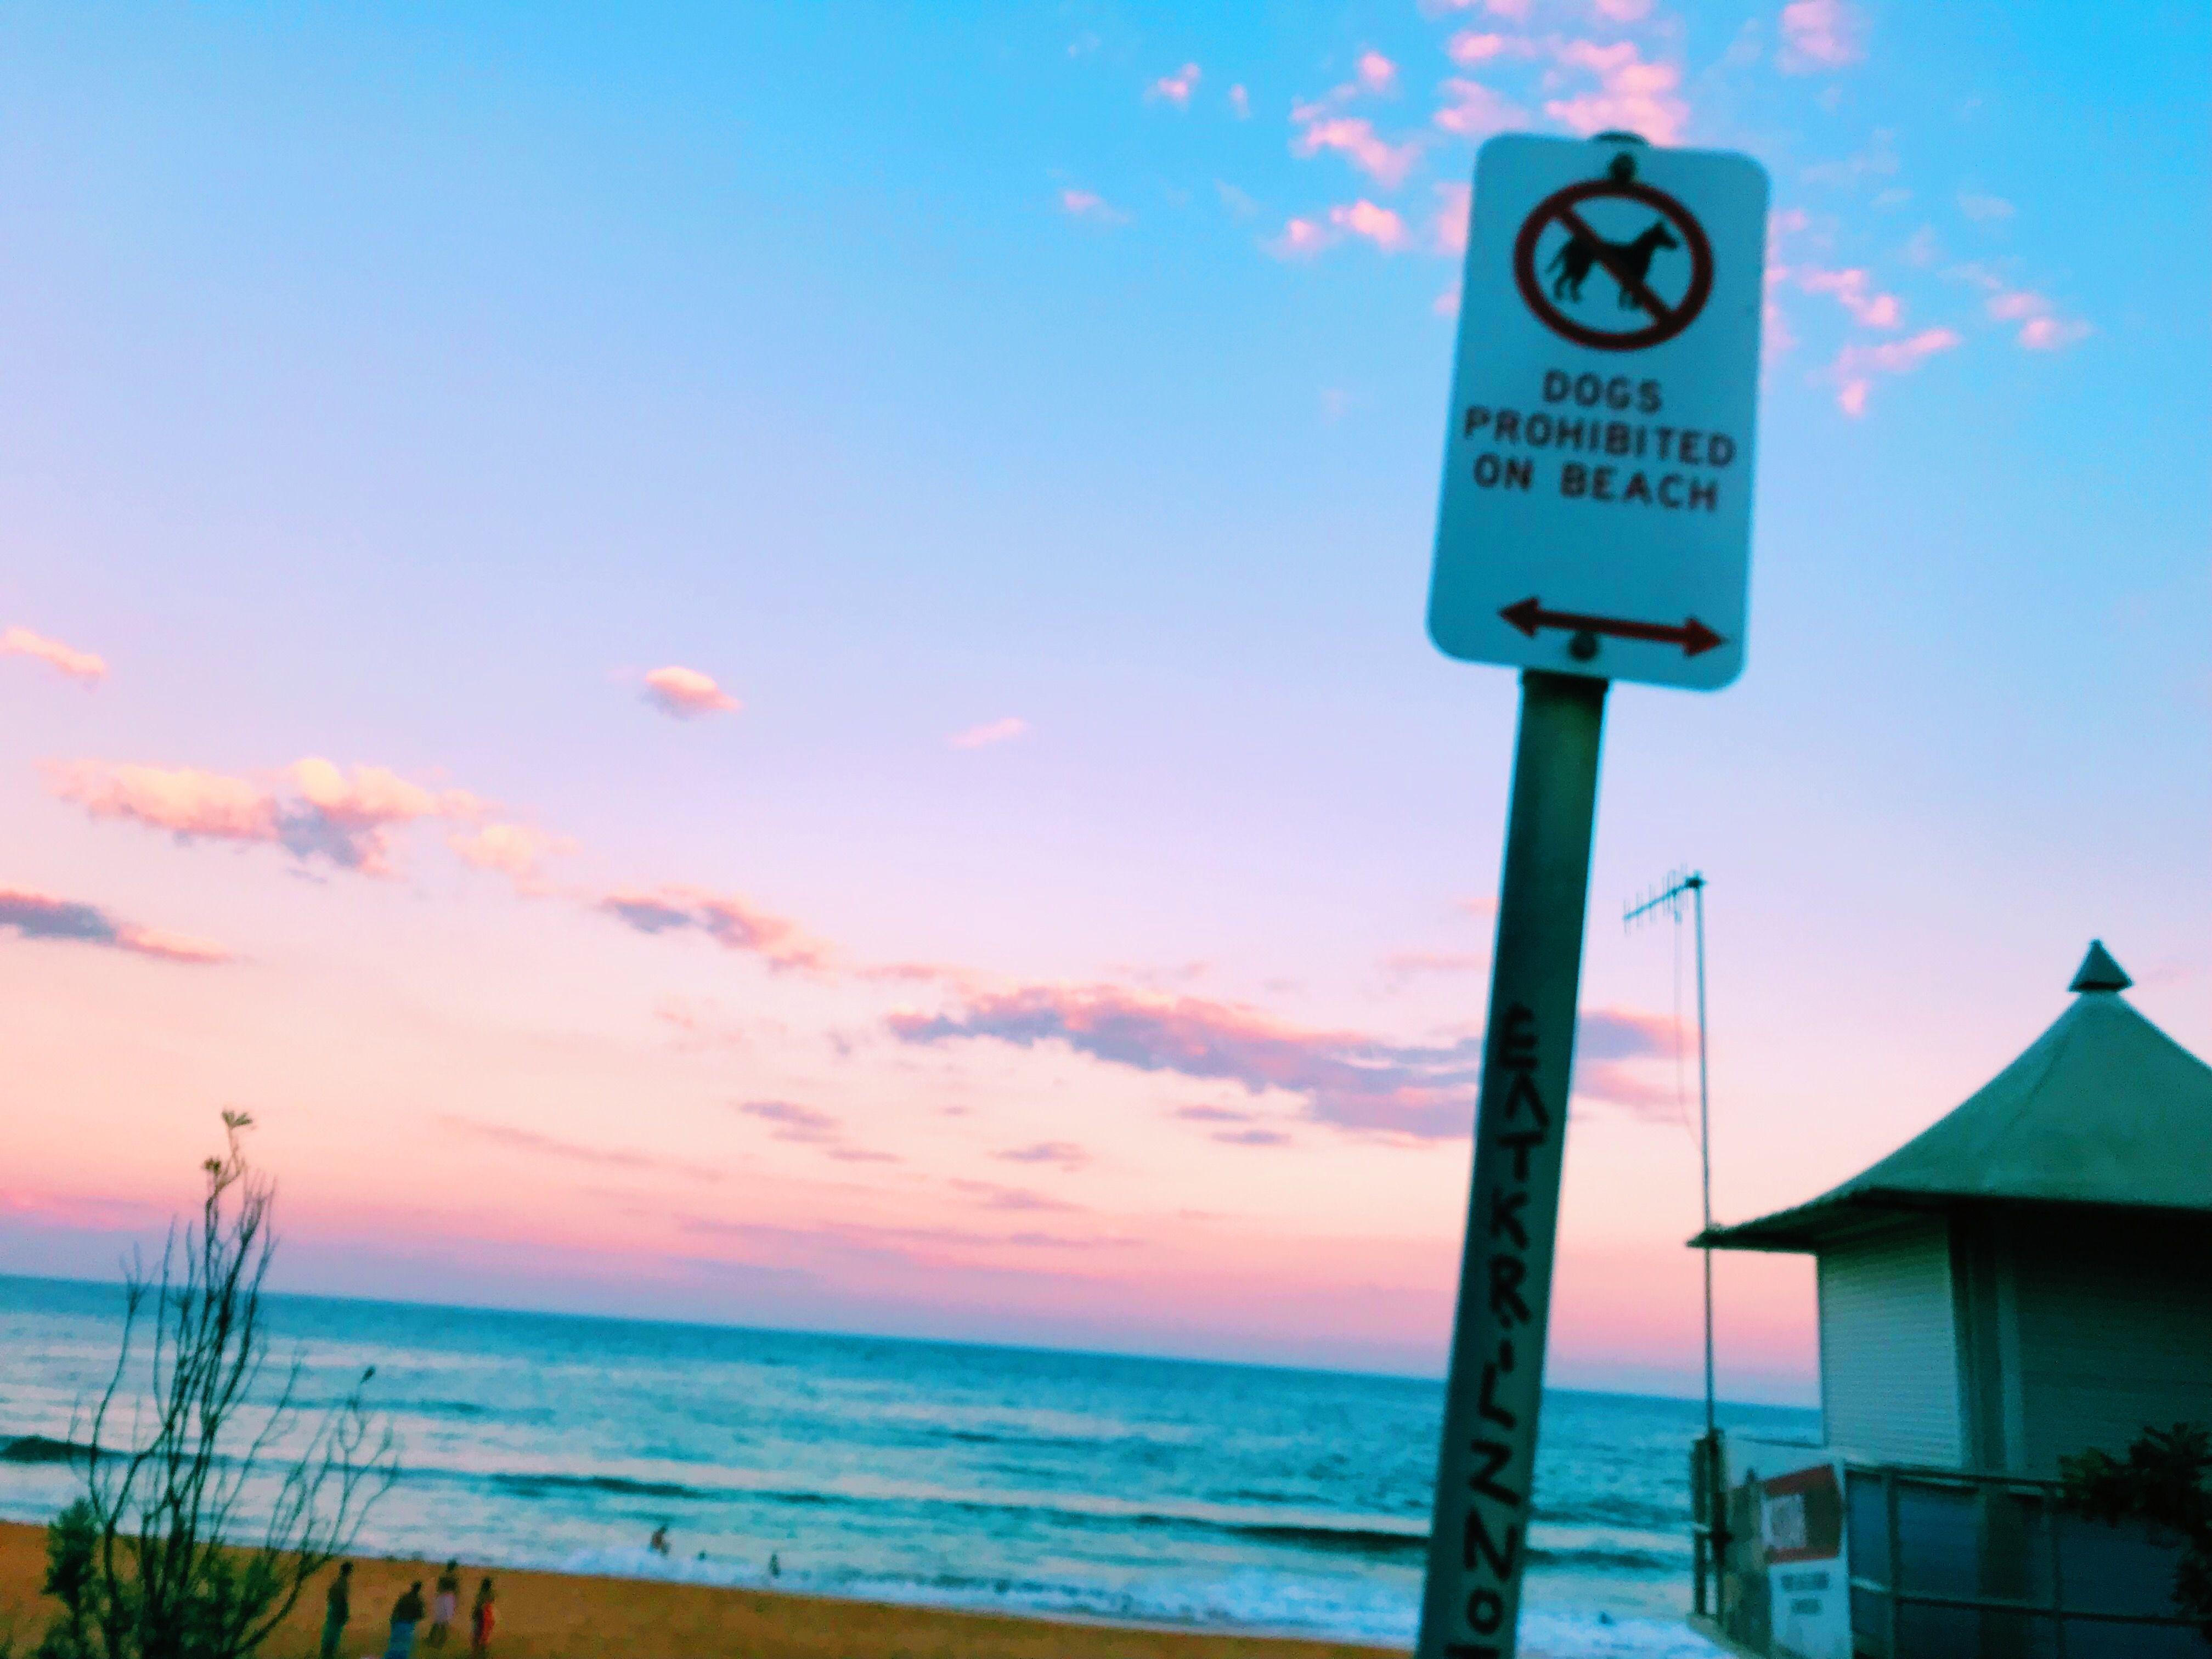 Pinterestisabellawillo summer beach tumblr sunsets pinterestisabellawillo summer beach tumblr sunsets summertime voltagebd Choice Image